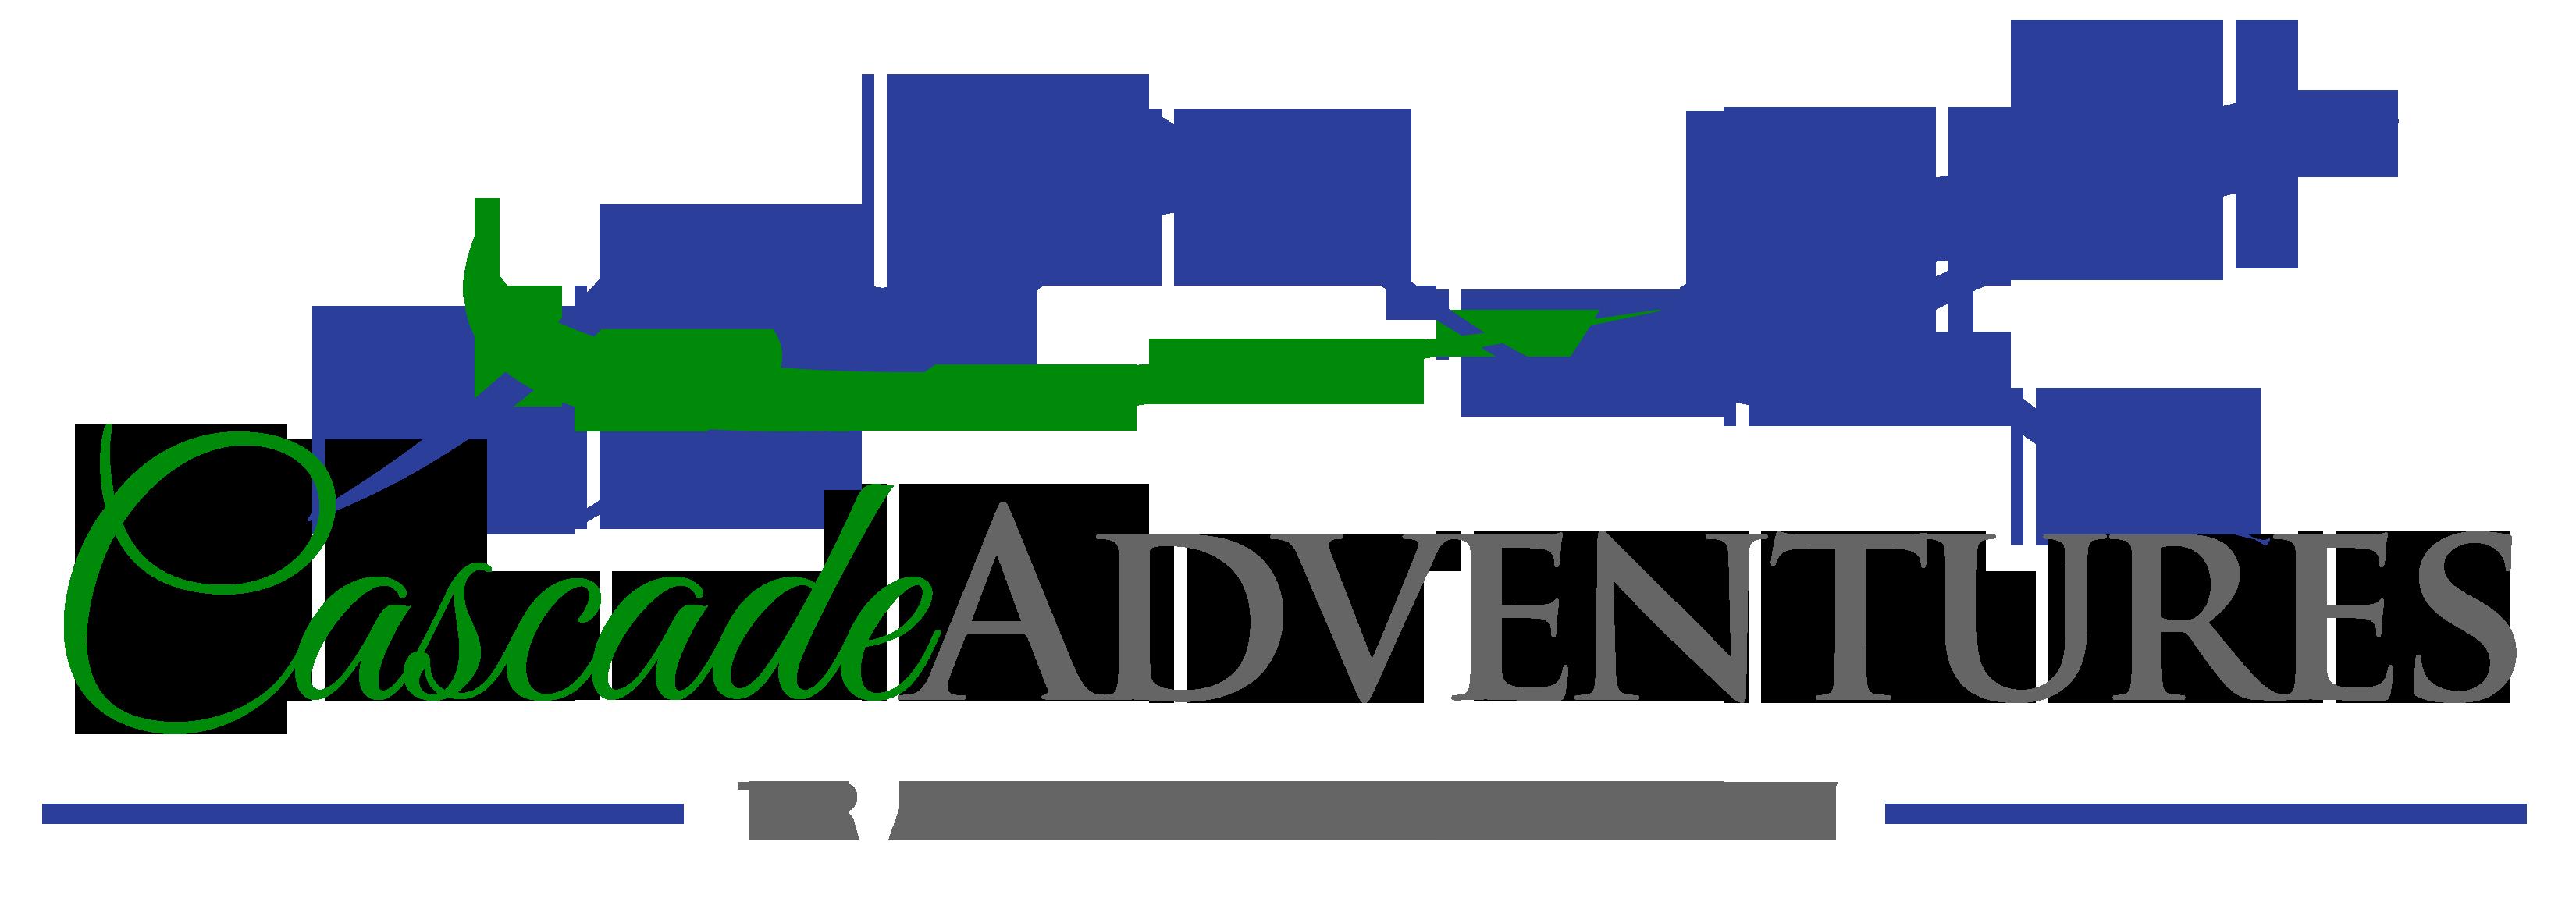 Logo for Cascade Adventures